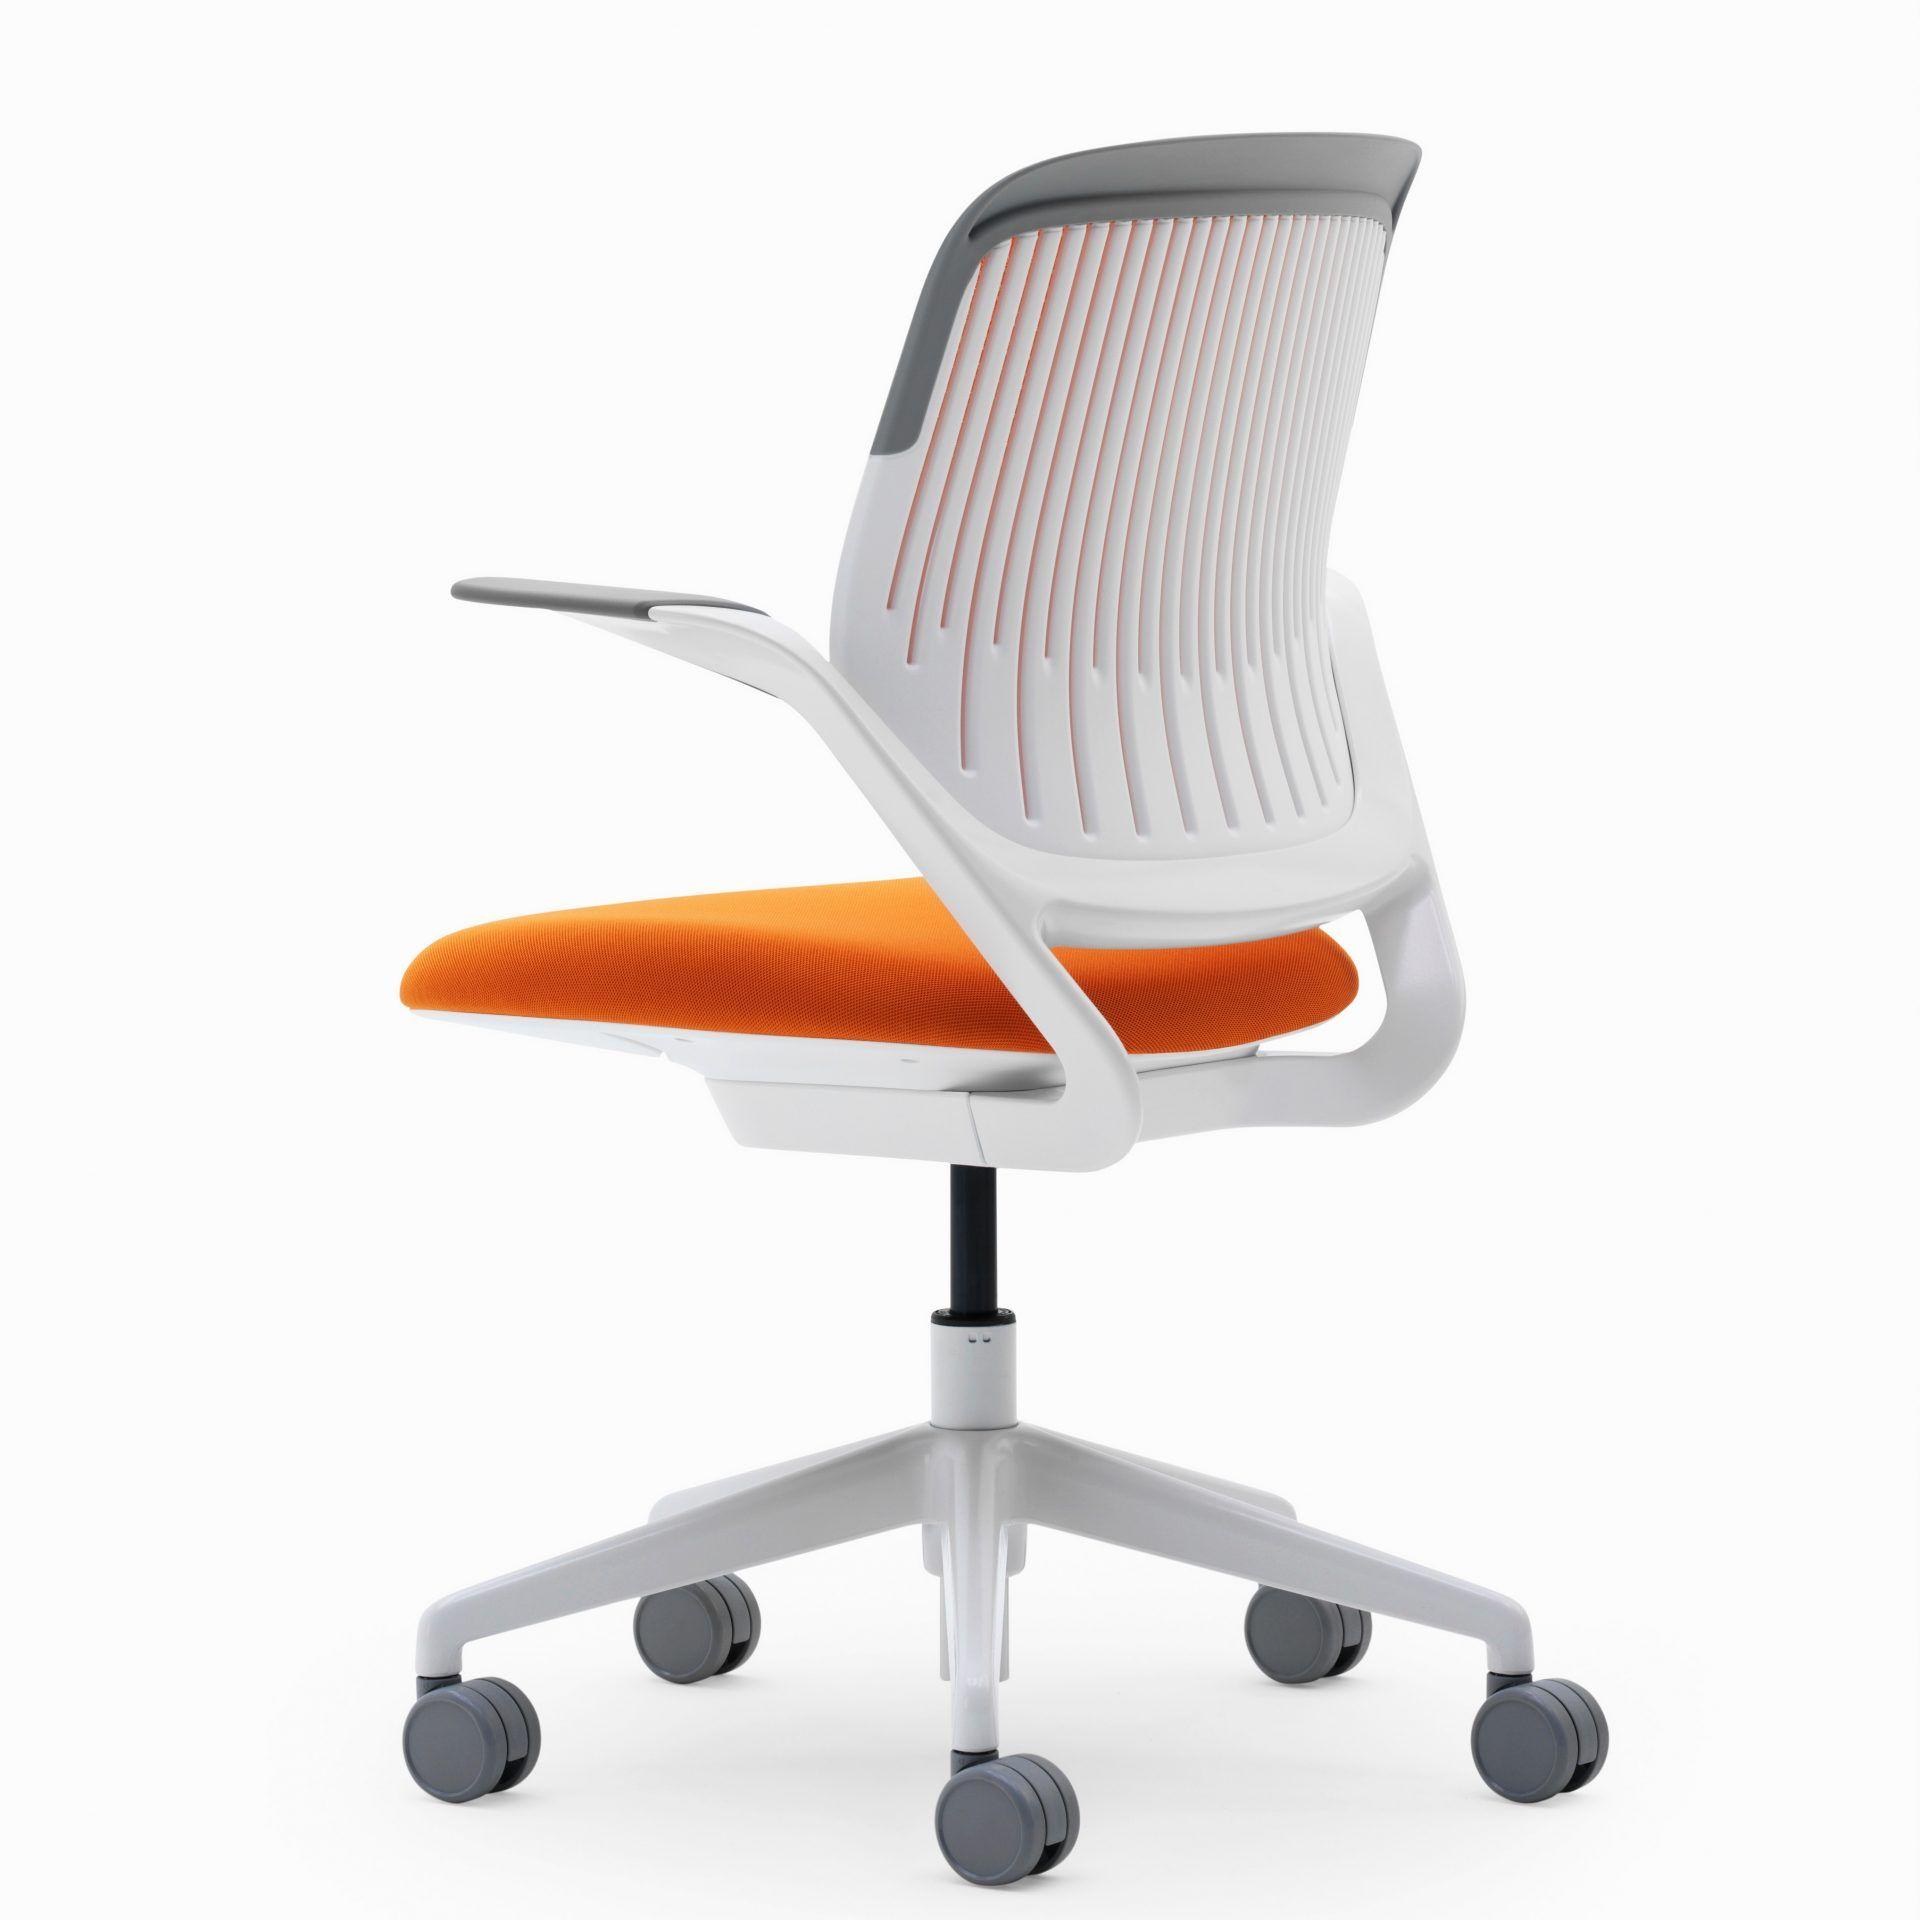 Cobi chair by Pearson Lloyd the Cobi office chair by